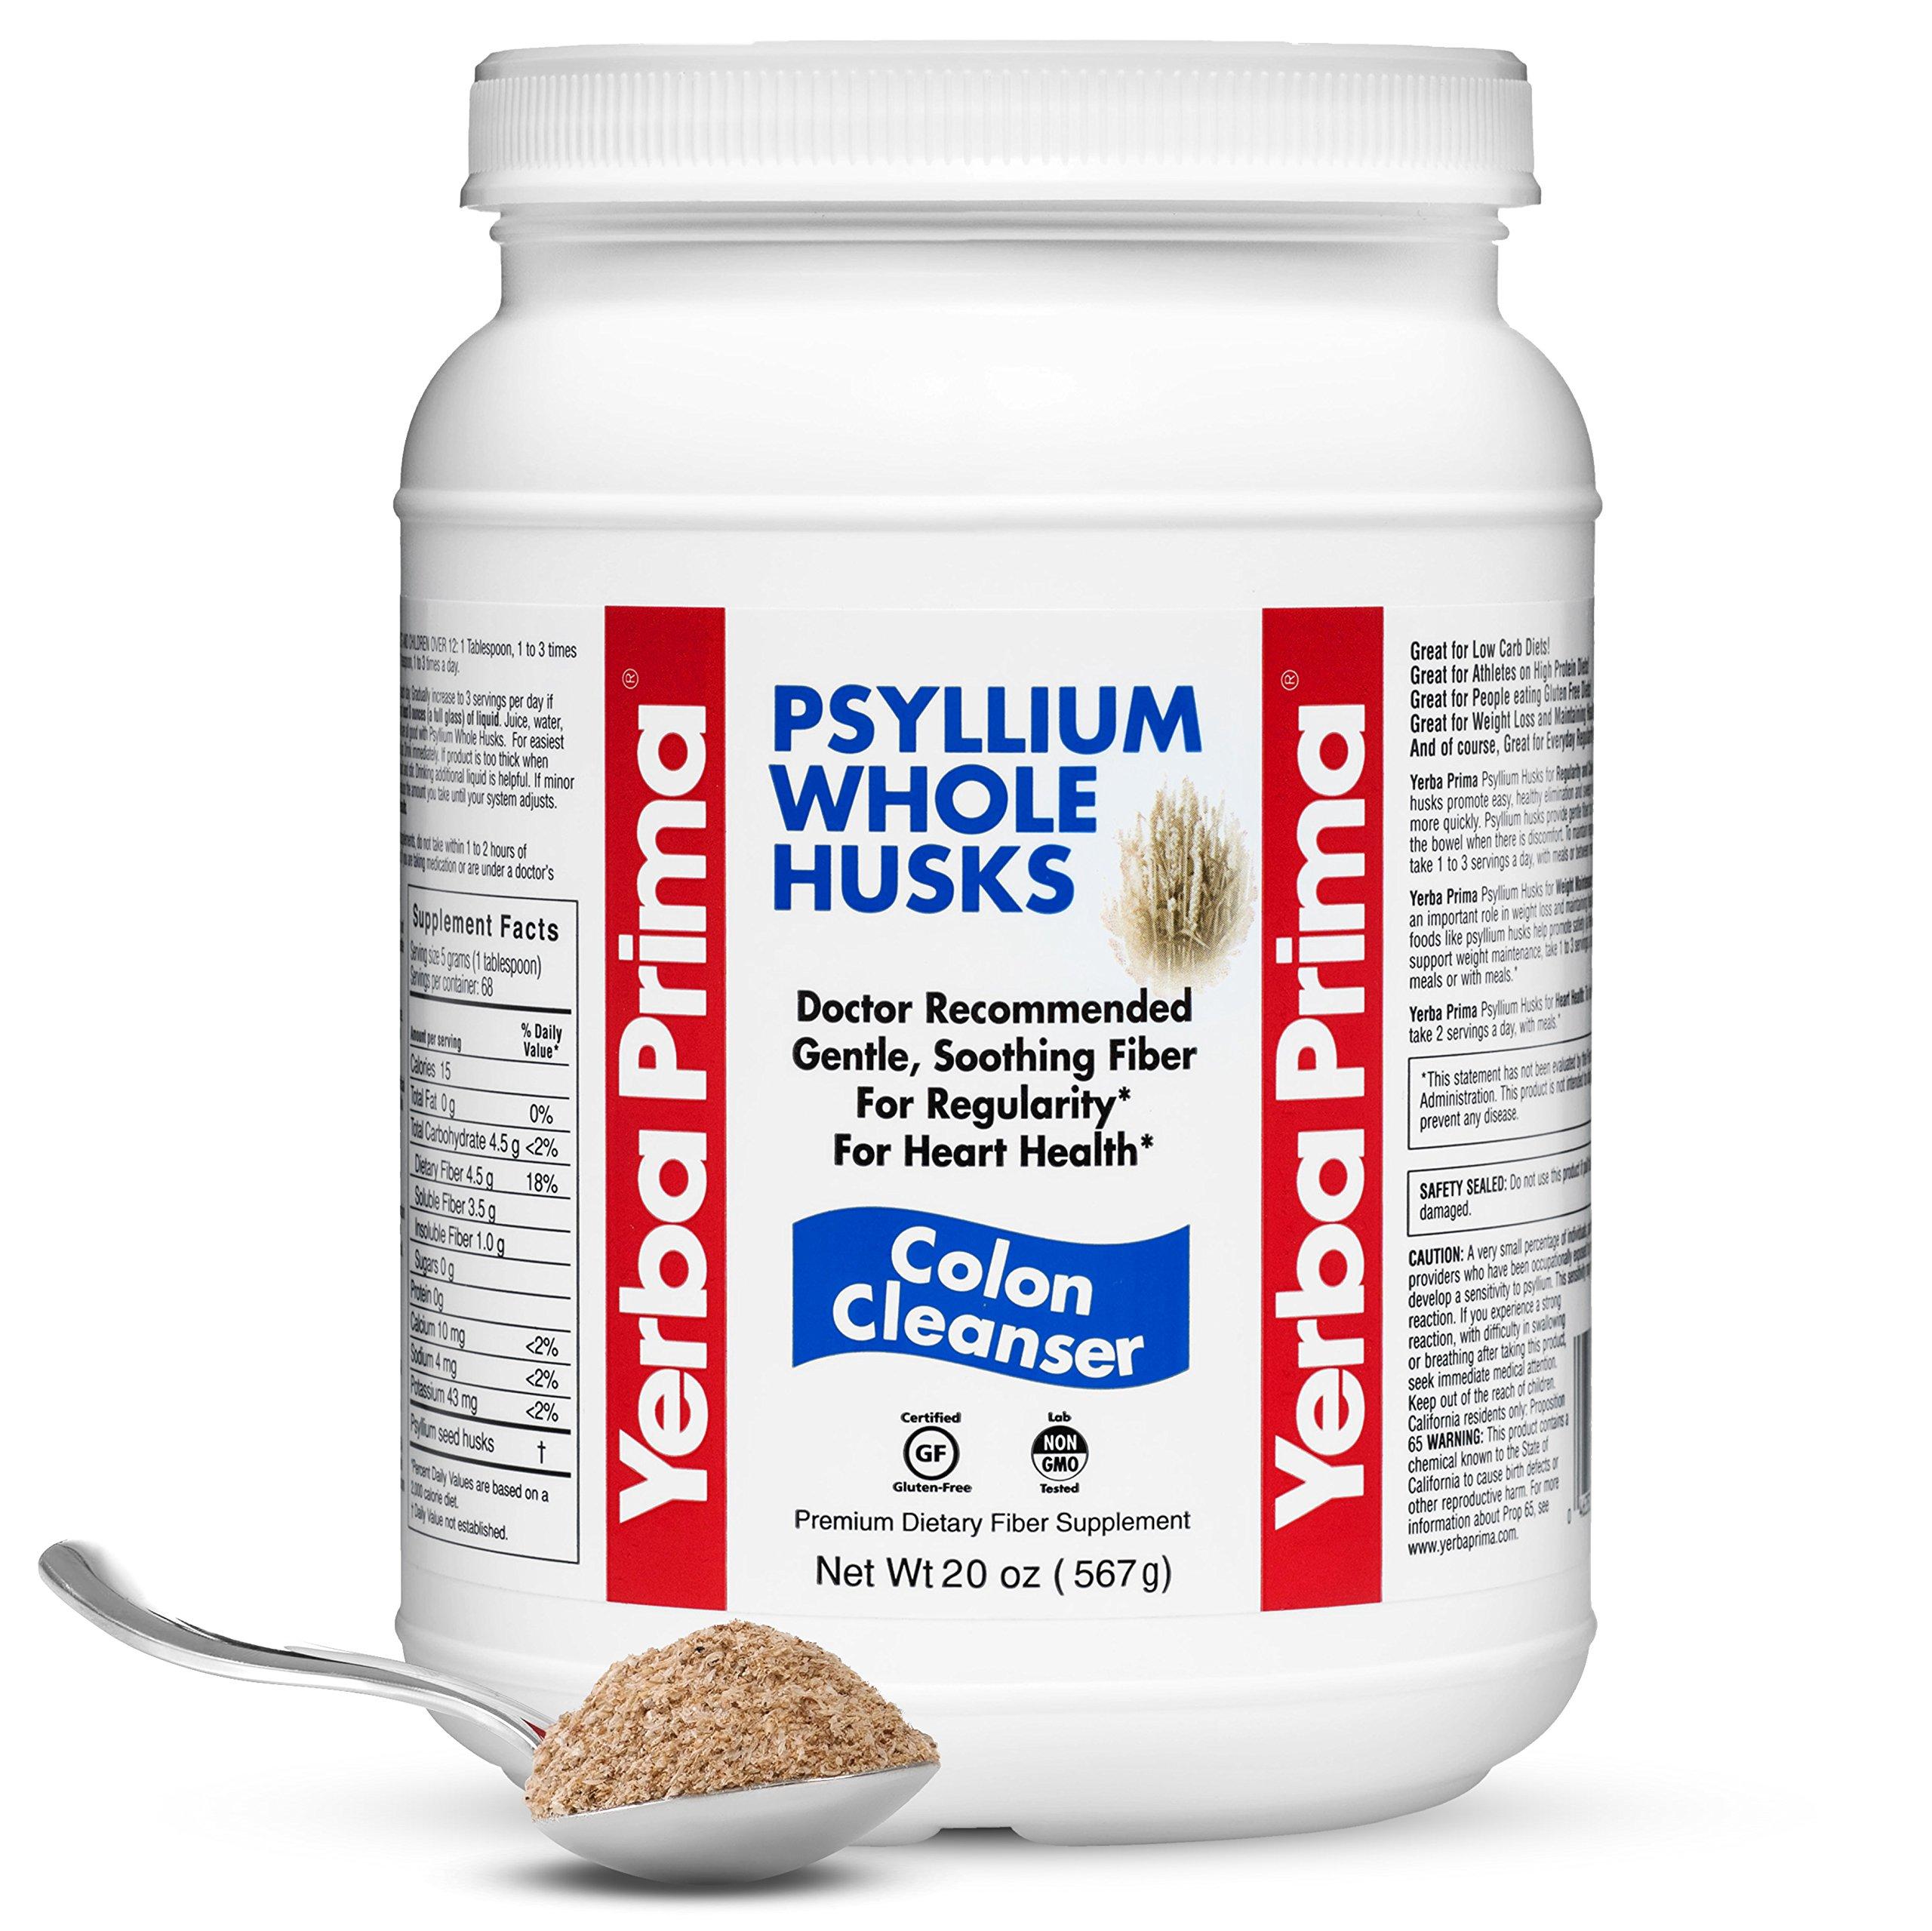 Yerba Prima Psyllium Whole Husks Colon Cleanser, All Natural, Dietary Fiber Supplement, 20 oz - (68 Servings) by Yerba Prima